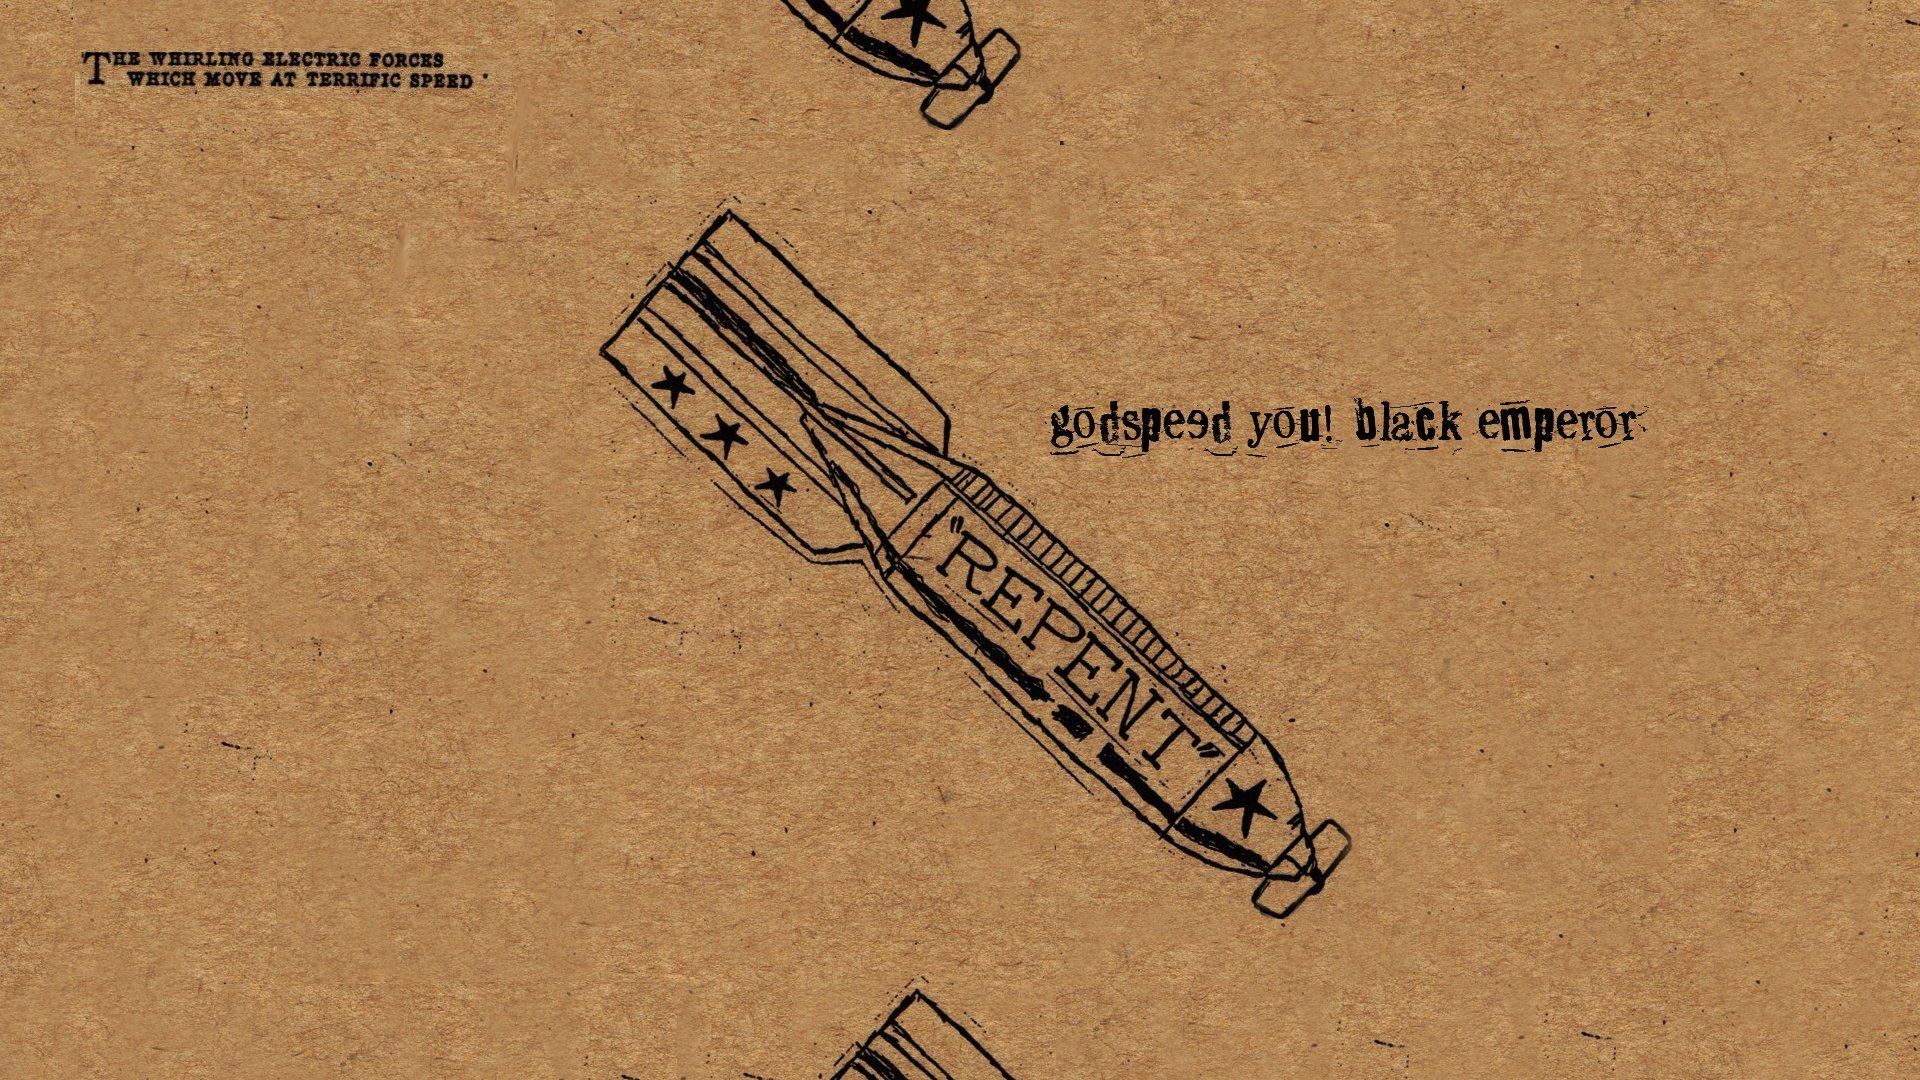 1 Godspeed You Black Emperor Fondos De Pantalla Hd Fondos